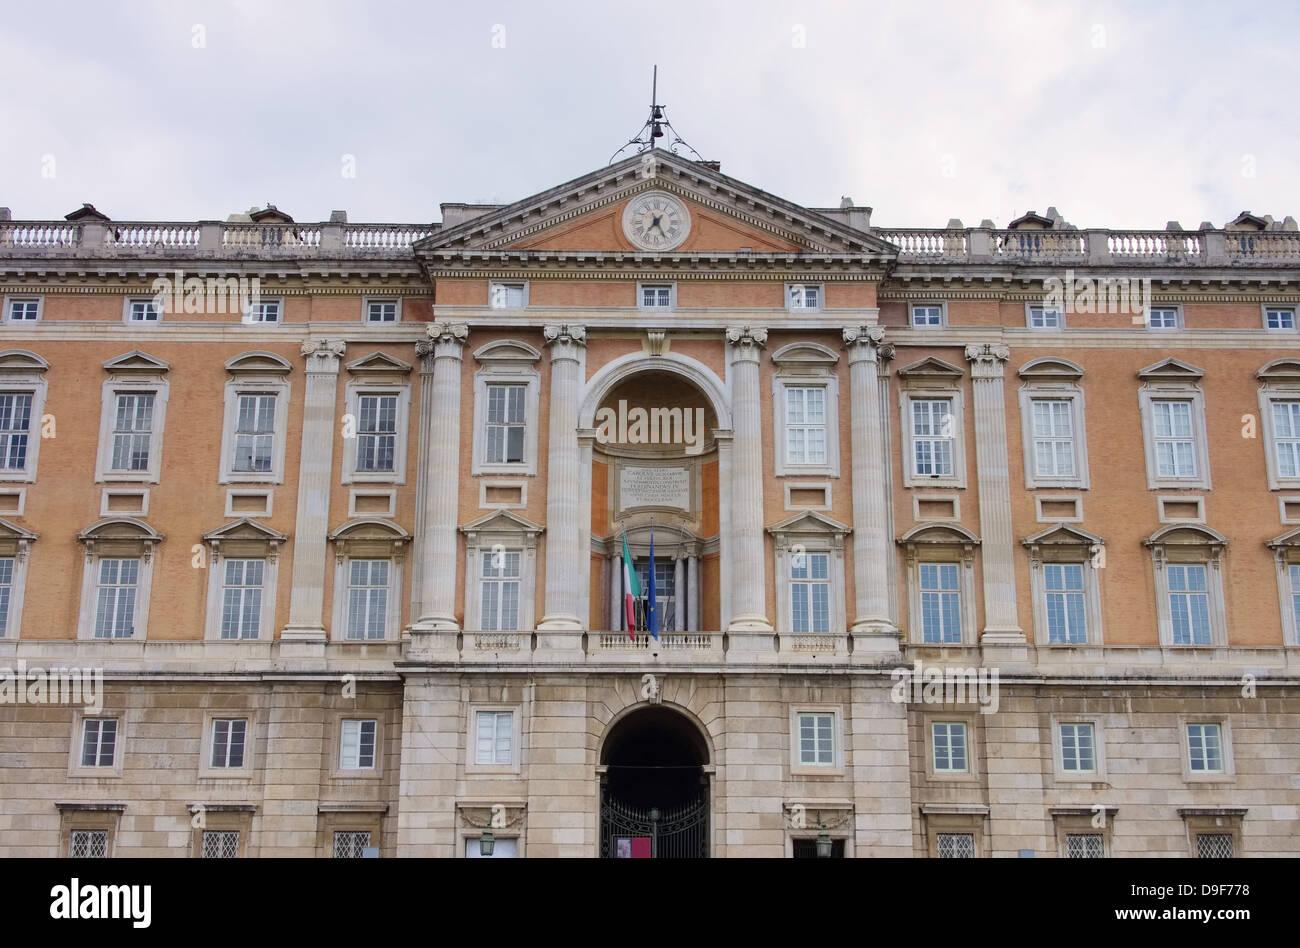 Caserta Palast - Caserta palace 02 - Stock Image